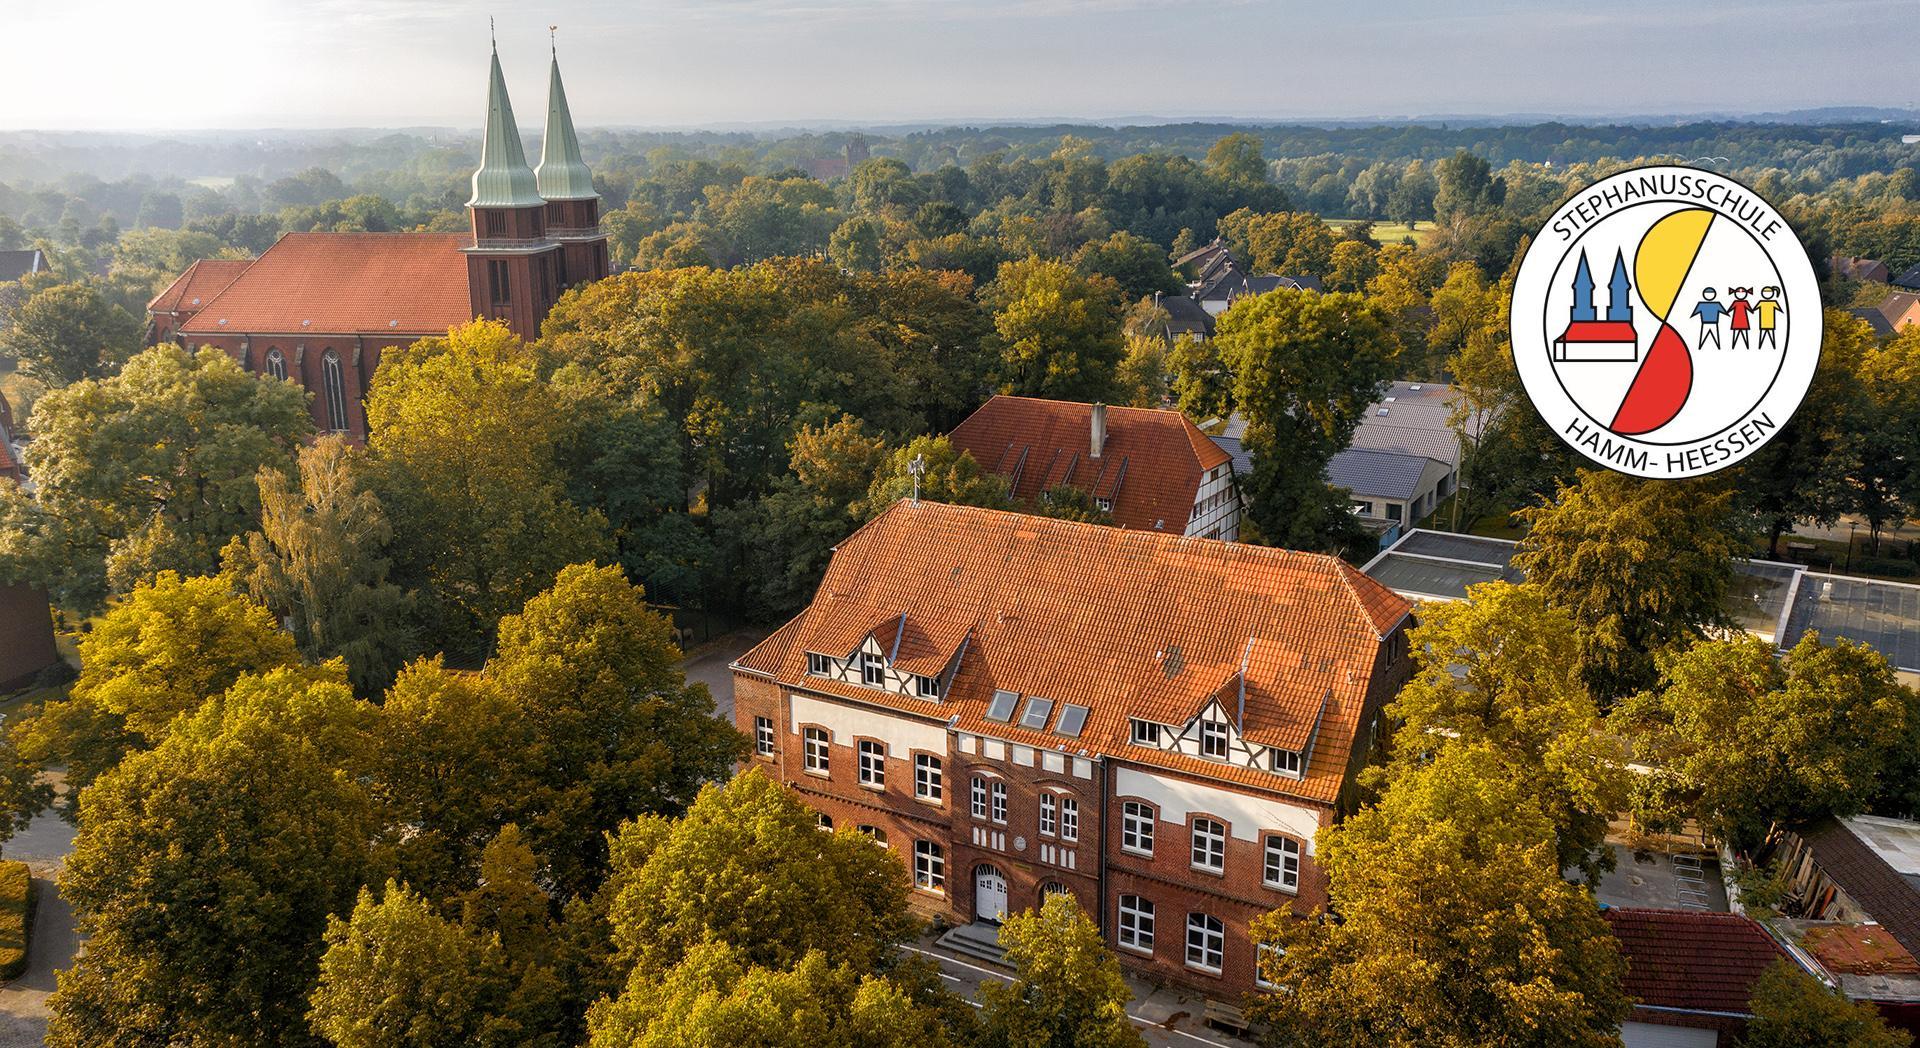 Stephanusschule